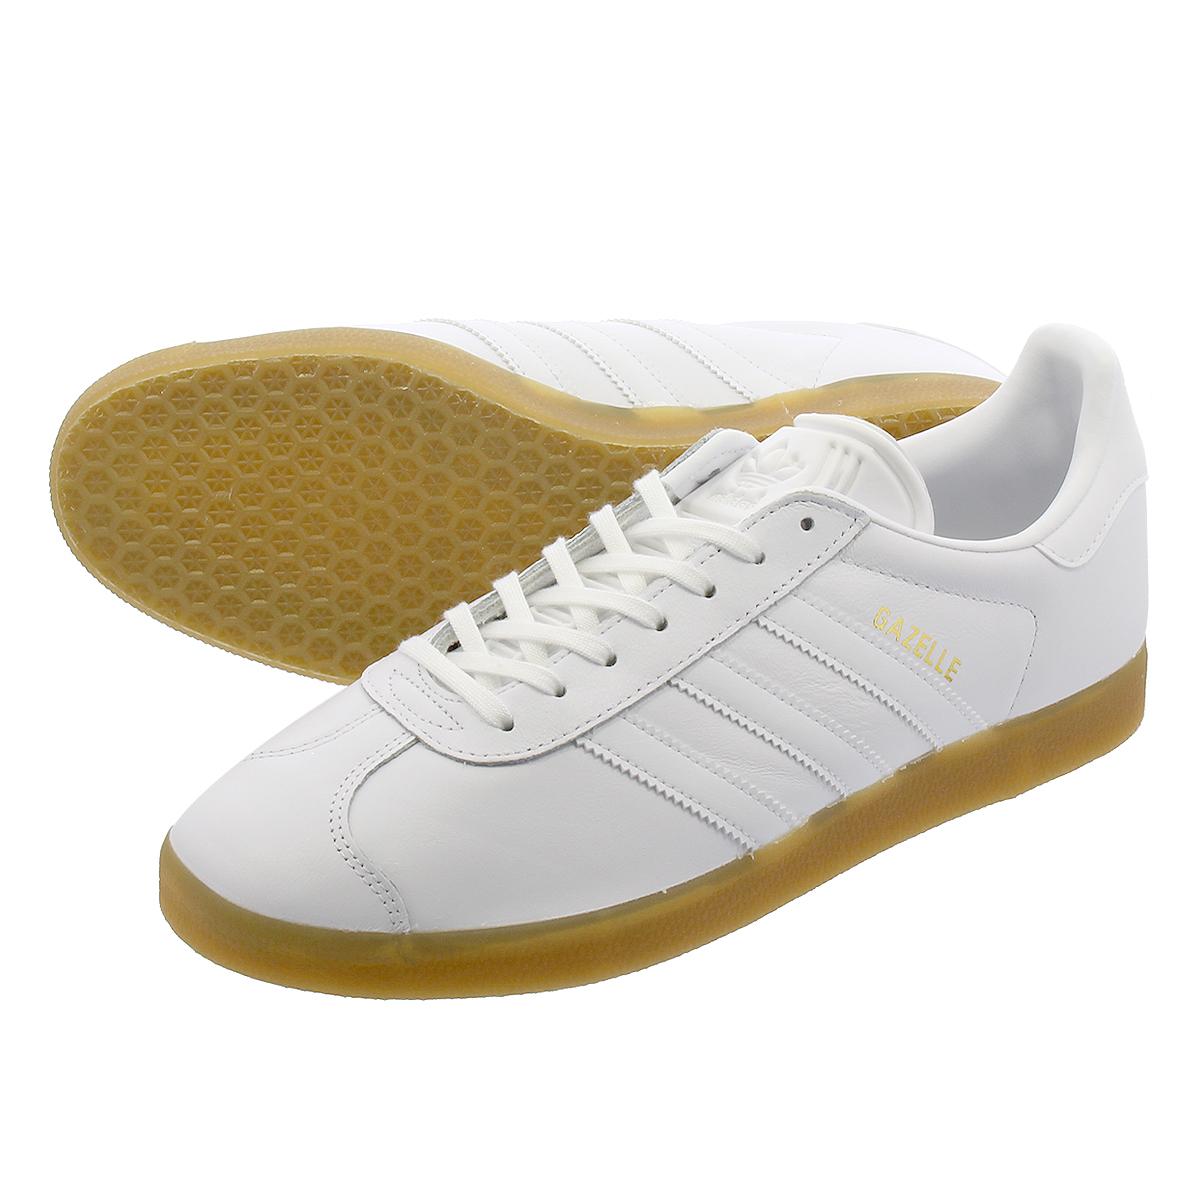 adidas GAZELLE 【adidas Originals】 アディダス ガッツレー ガゼル RUNING WHITE/RUNNING WHITE/GUM bd7479